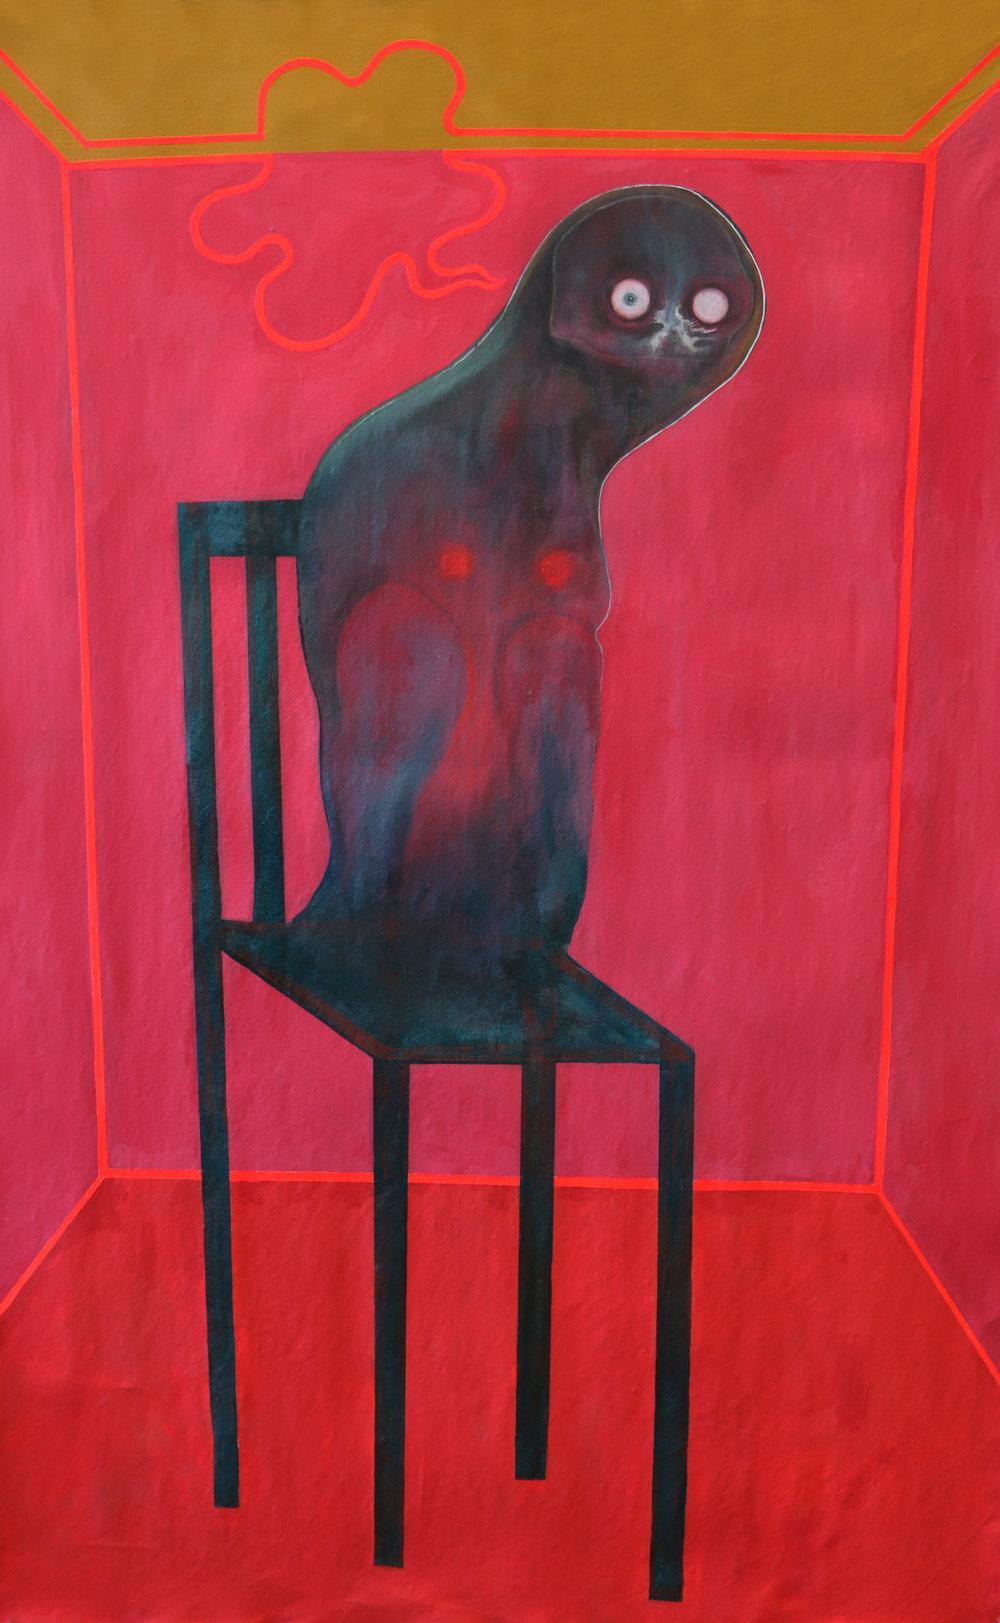 "child's pose. Acrylic on canvas. 40"" x 65."" 2019"